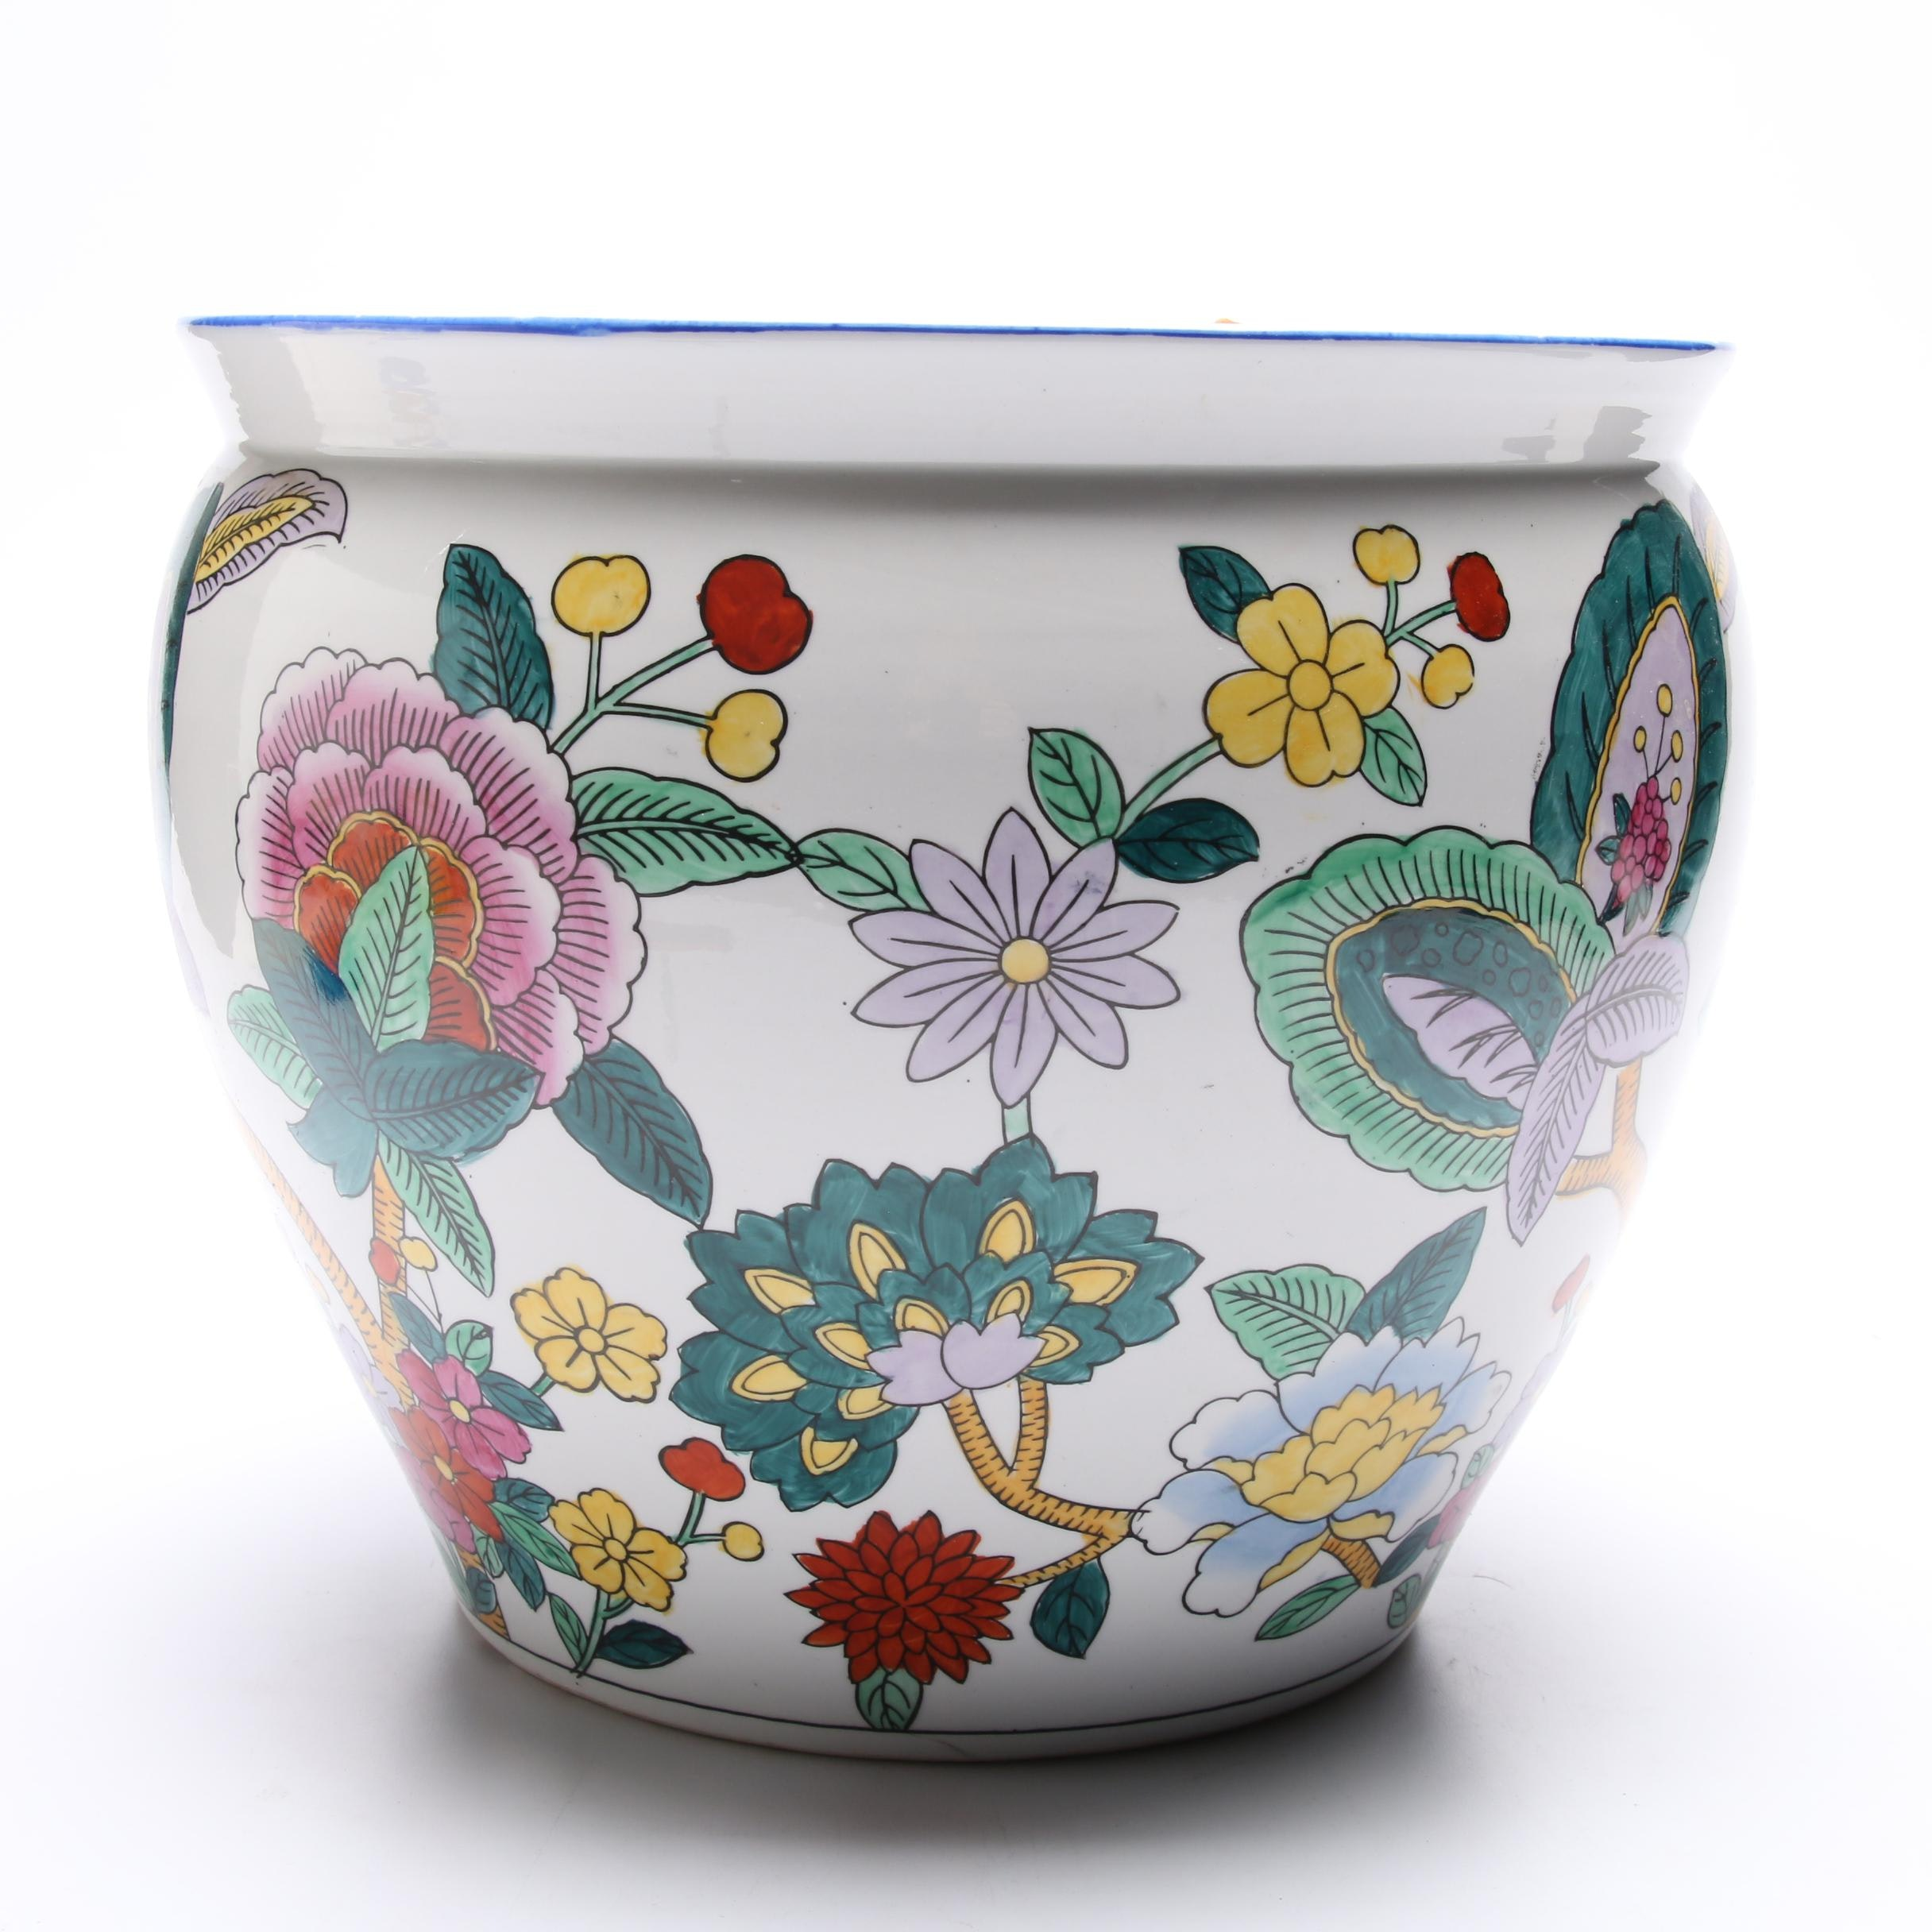 Chinese Decorative Ceramic Planter